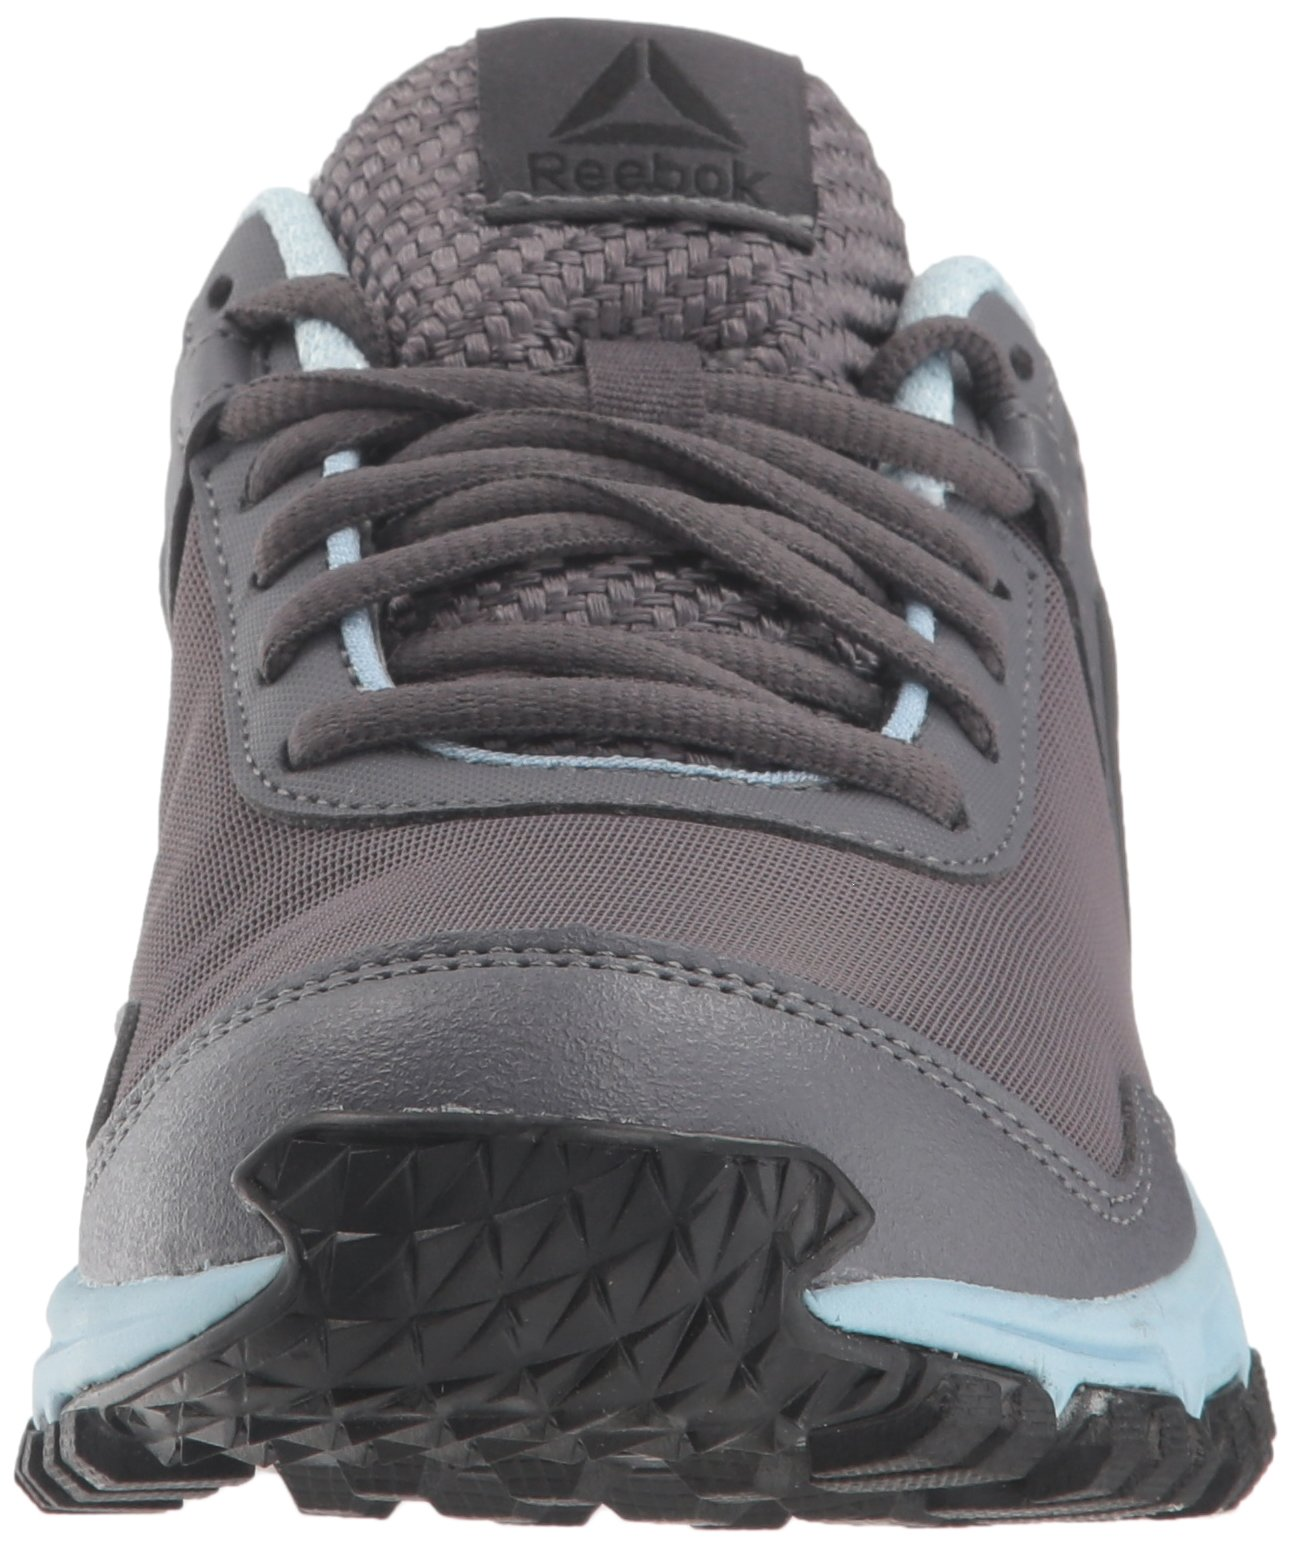 Reebok Women's Ridgerider Trail 3.0 Walking Shoe, ash Grey/Dreamy Blue/blac, 7.5 M US by Reebok (Image #4)